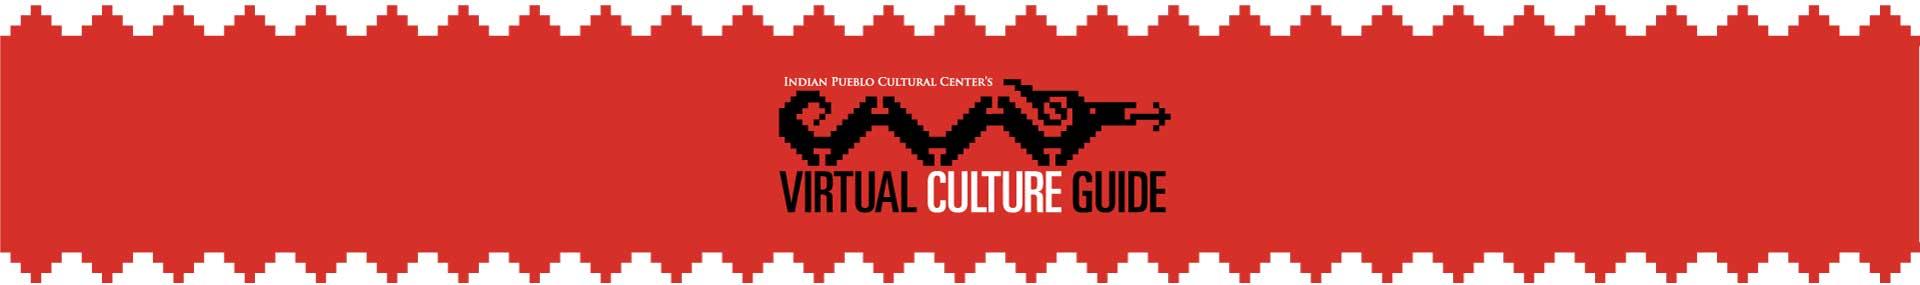 IPCC's Virtual Culture Guide